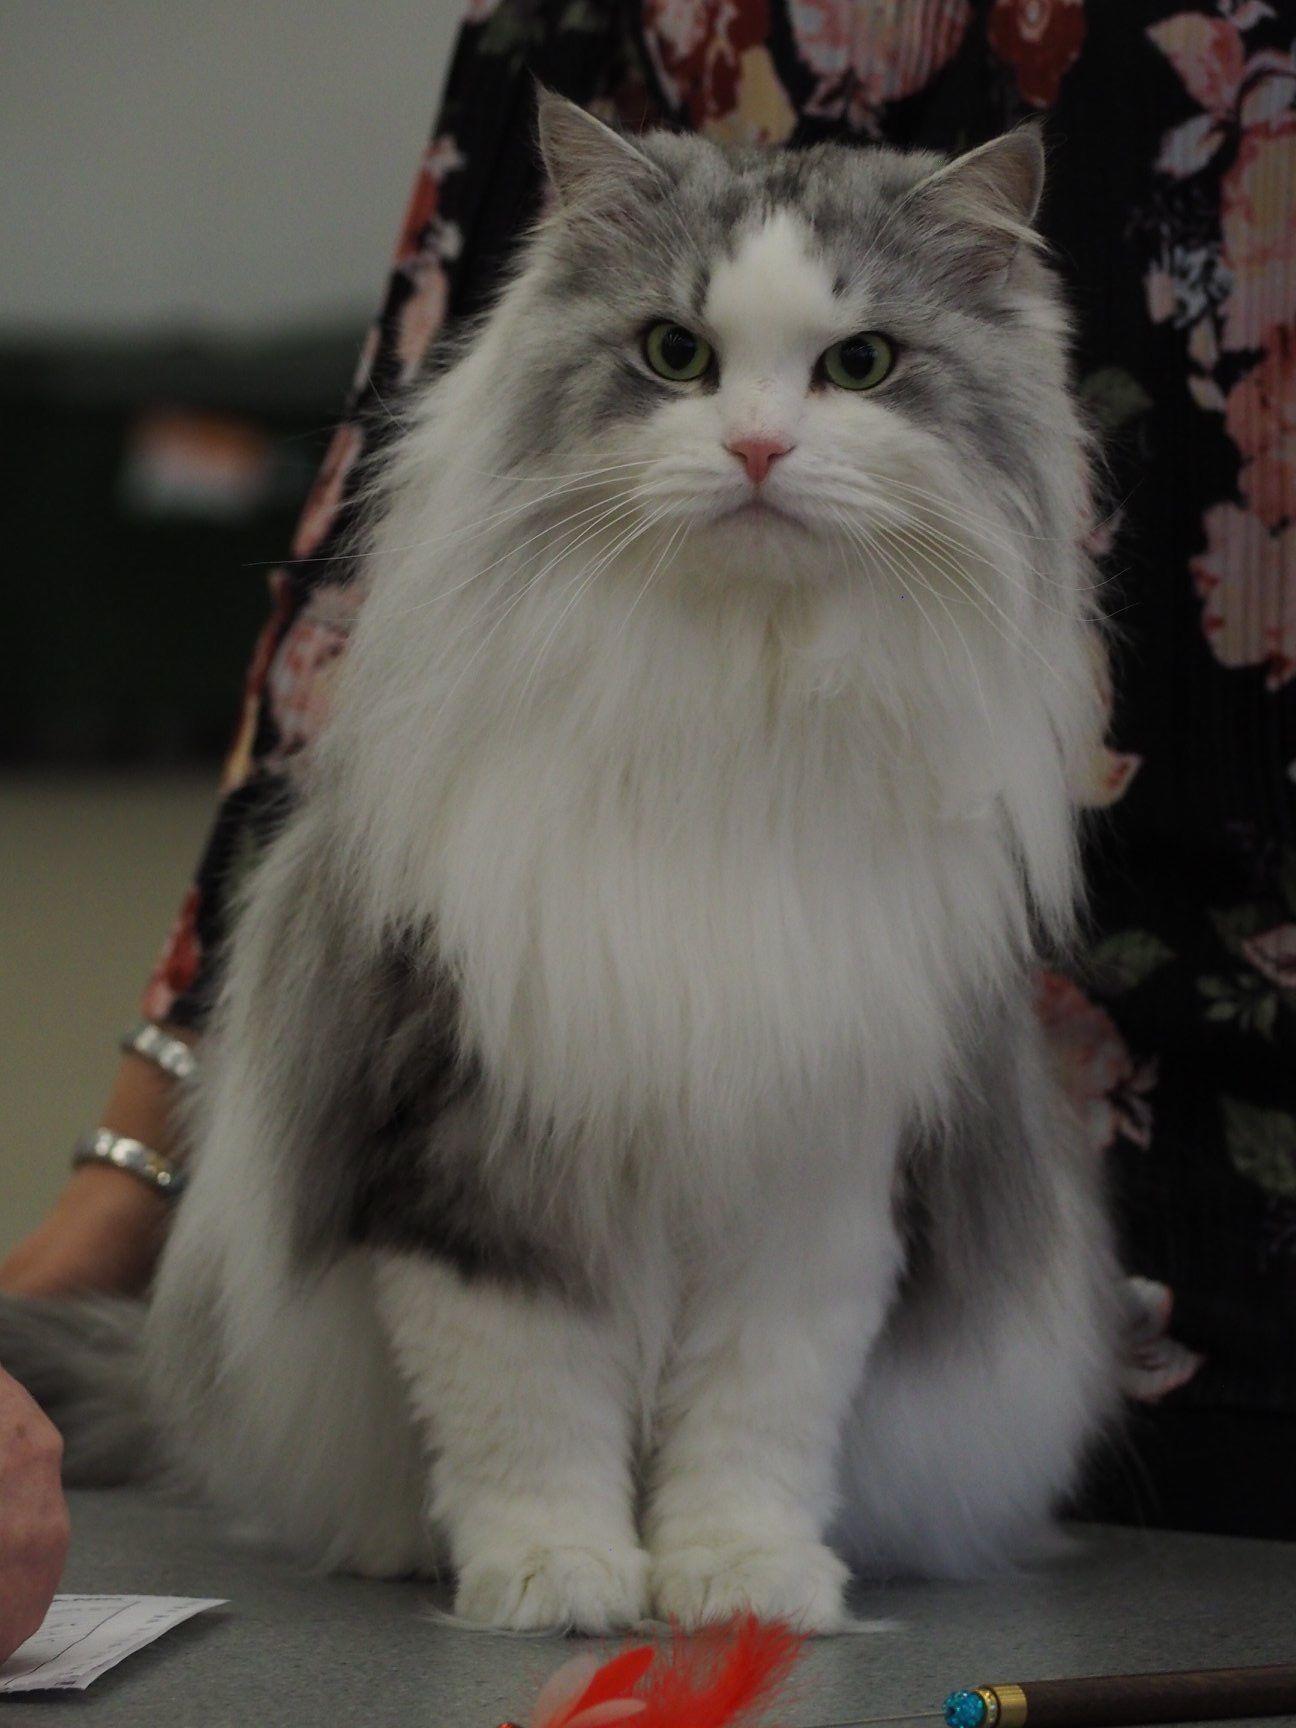 Pin By Jaana Siven On Karhunhovi Siberian Cat Animals Cats